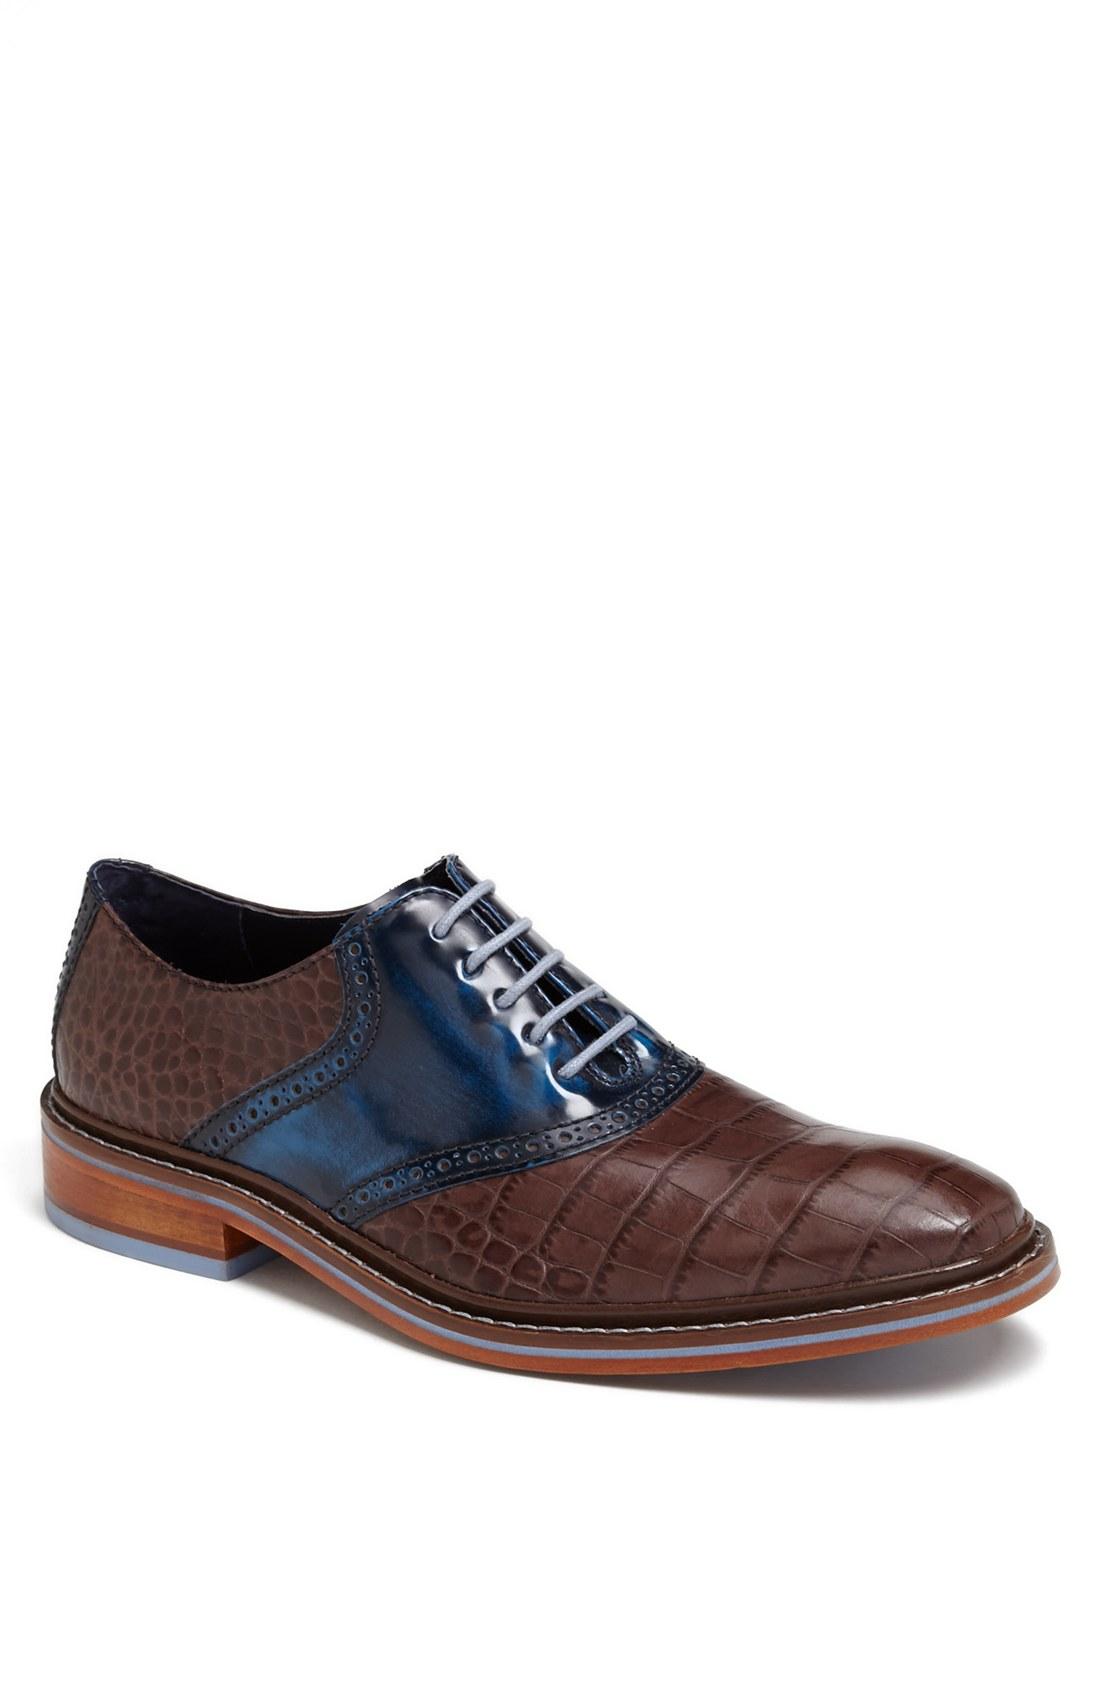 Cole Haan Colton Winter Saddle Shoe in Brown for Men (Chestnut Croc